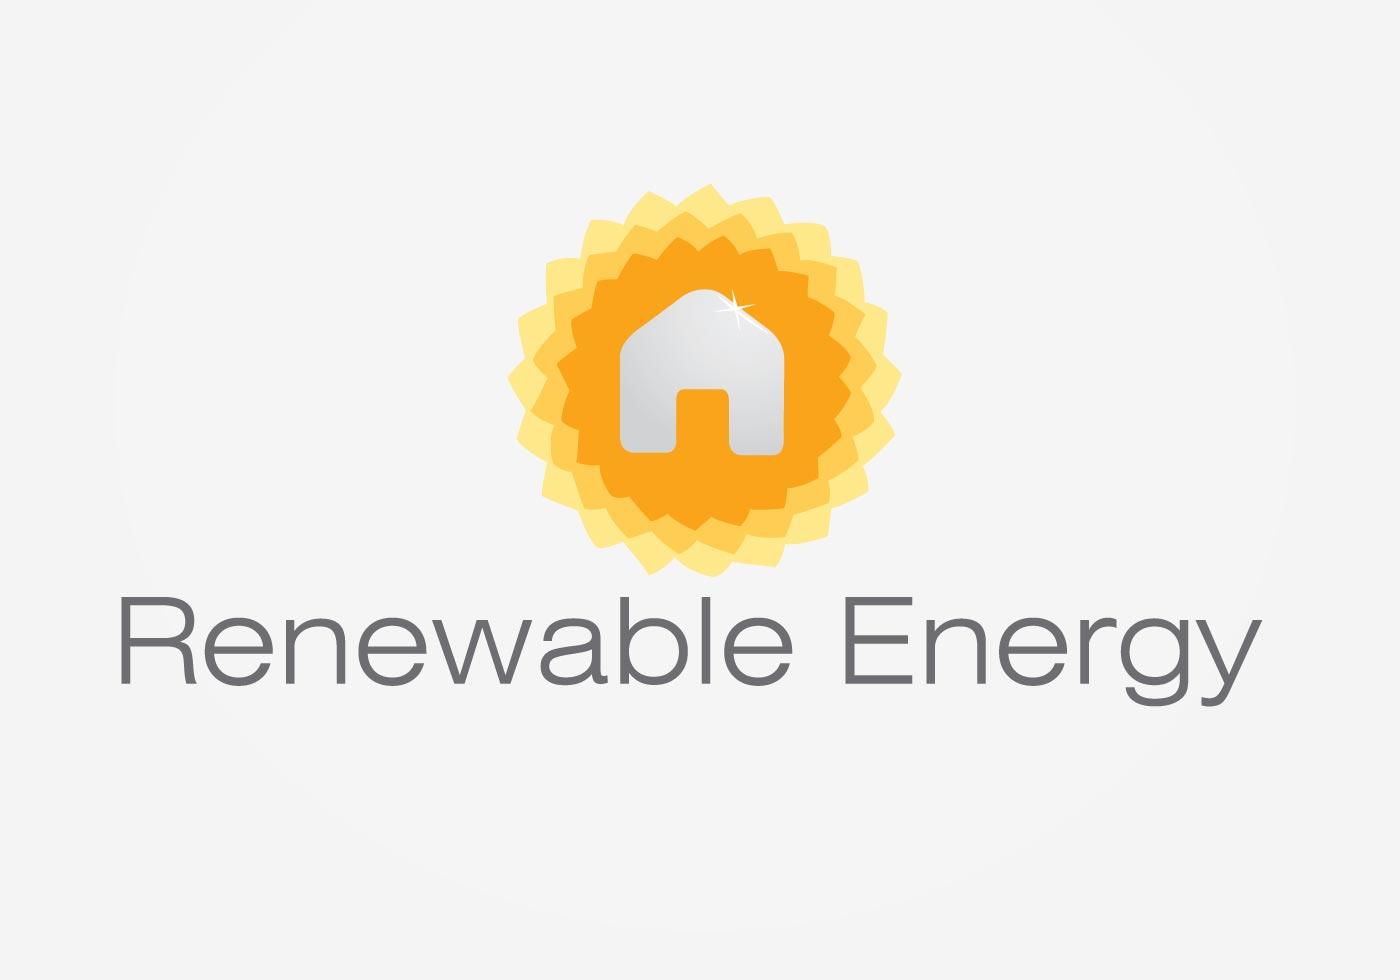 renewable energy free vector art 1705 free downloads